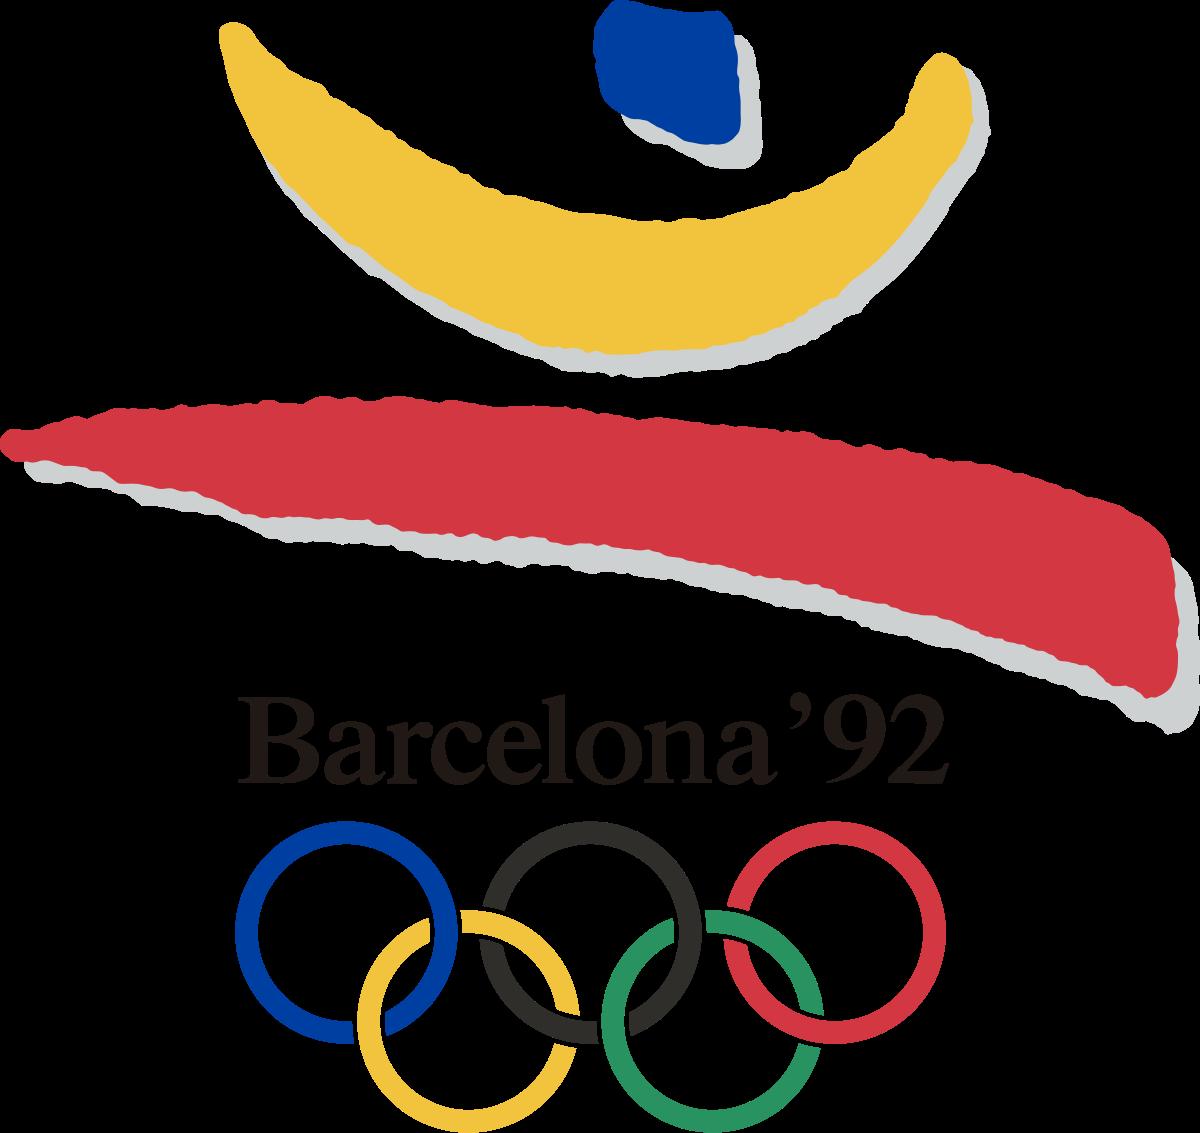 barcelona-92.png